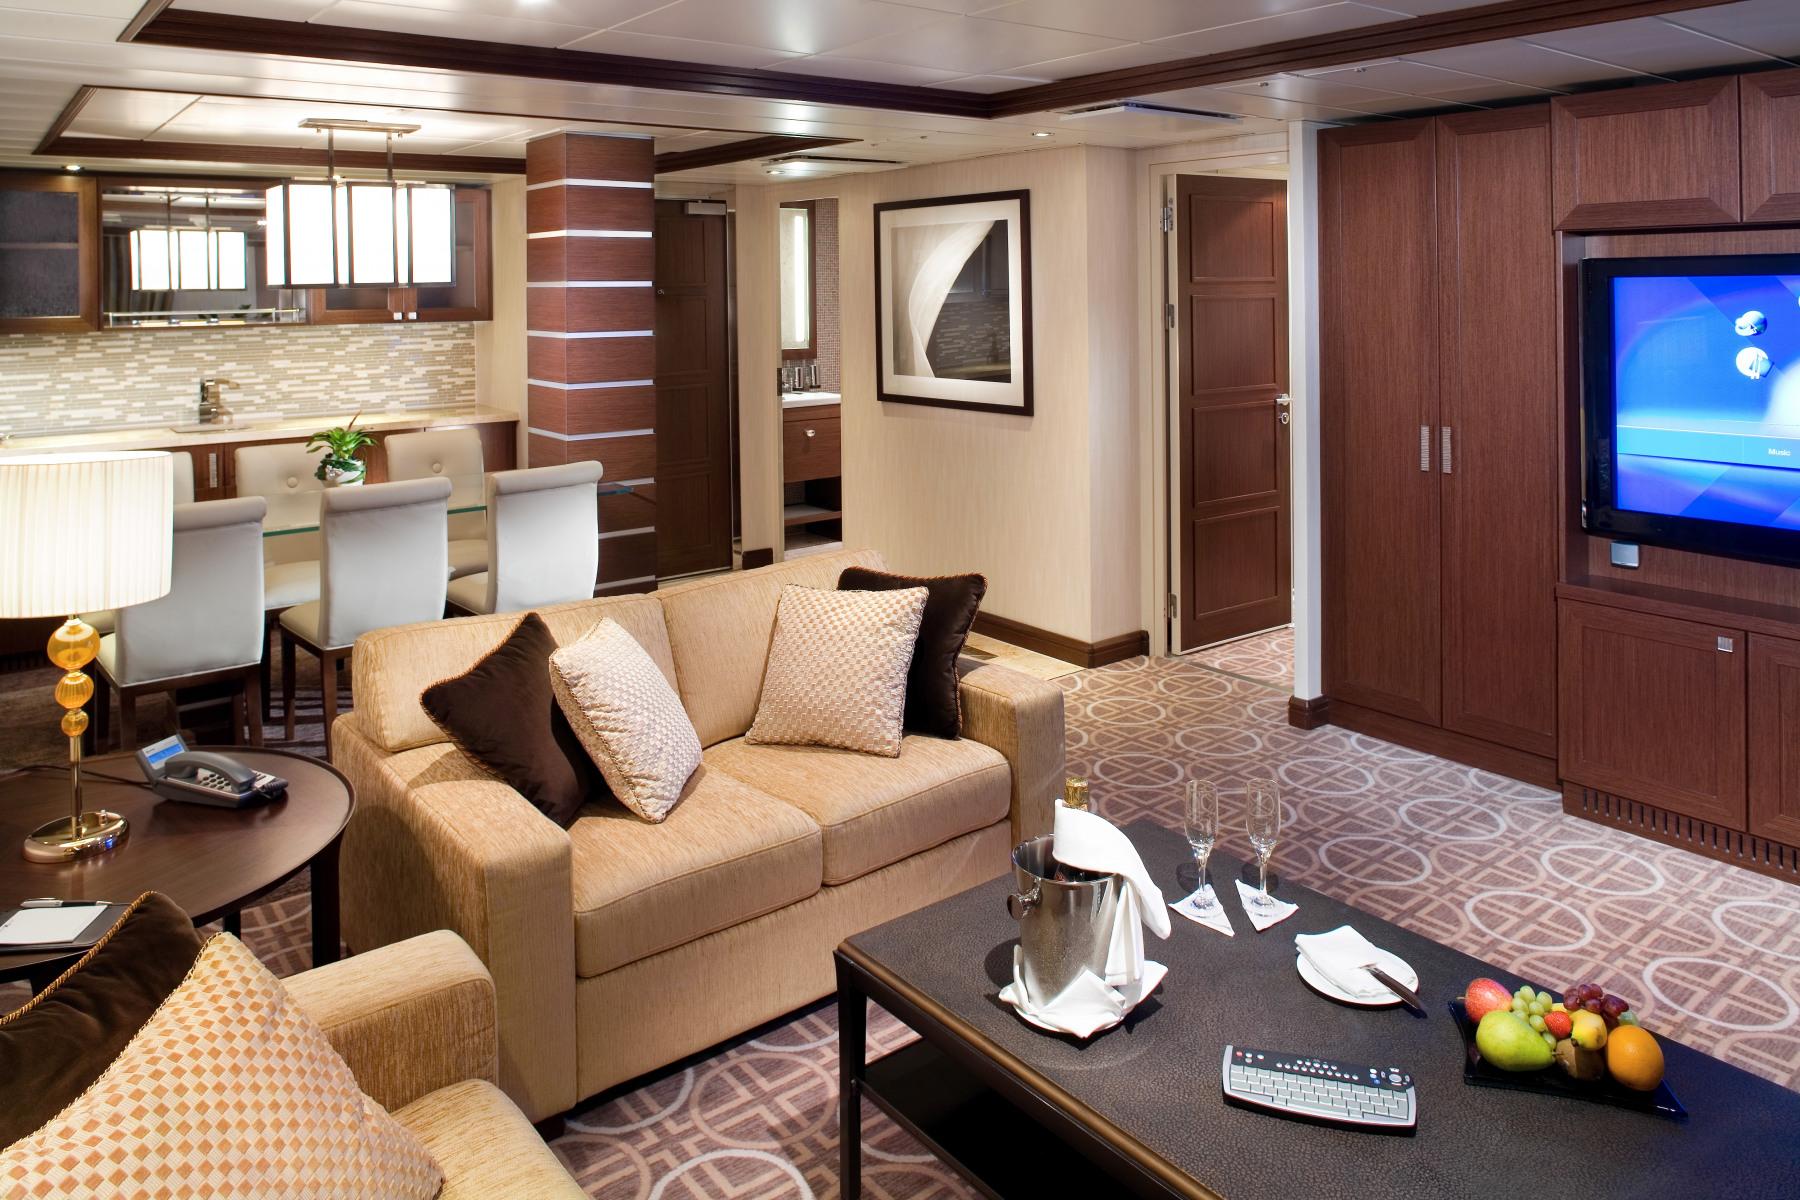 celebrity cruises celebrity eclipse accommodation royal suite.jpg